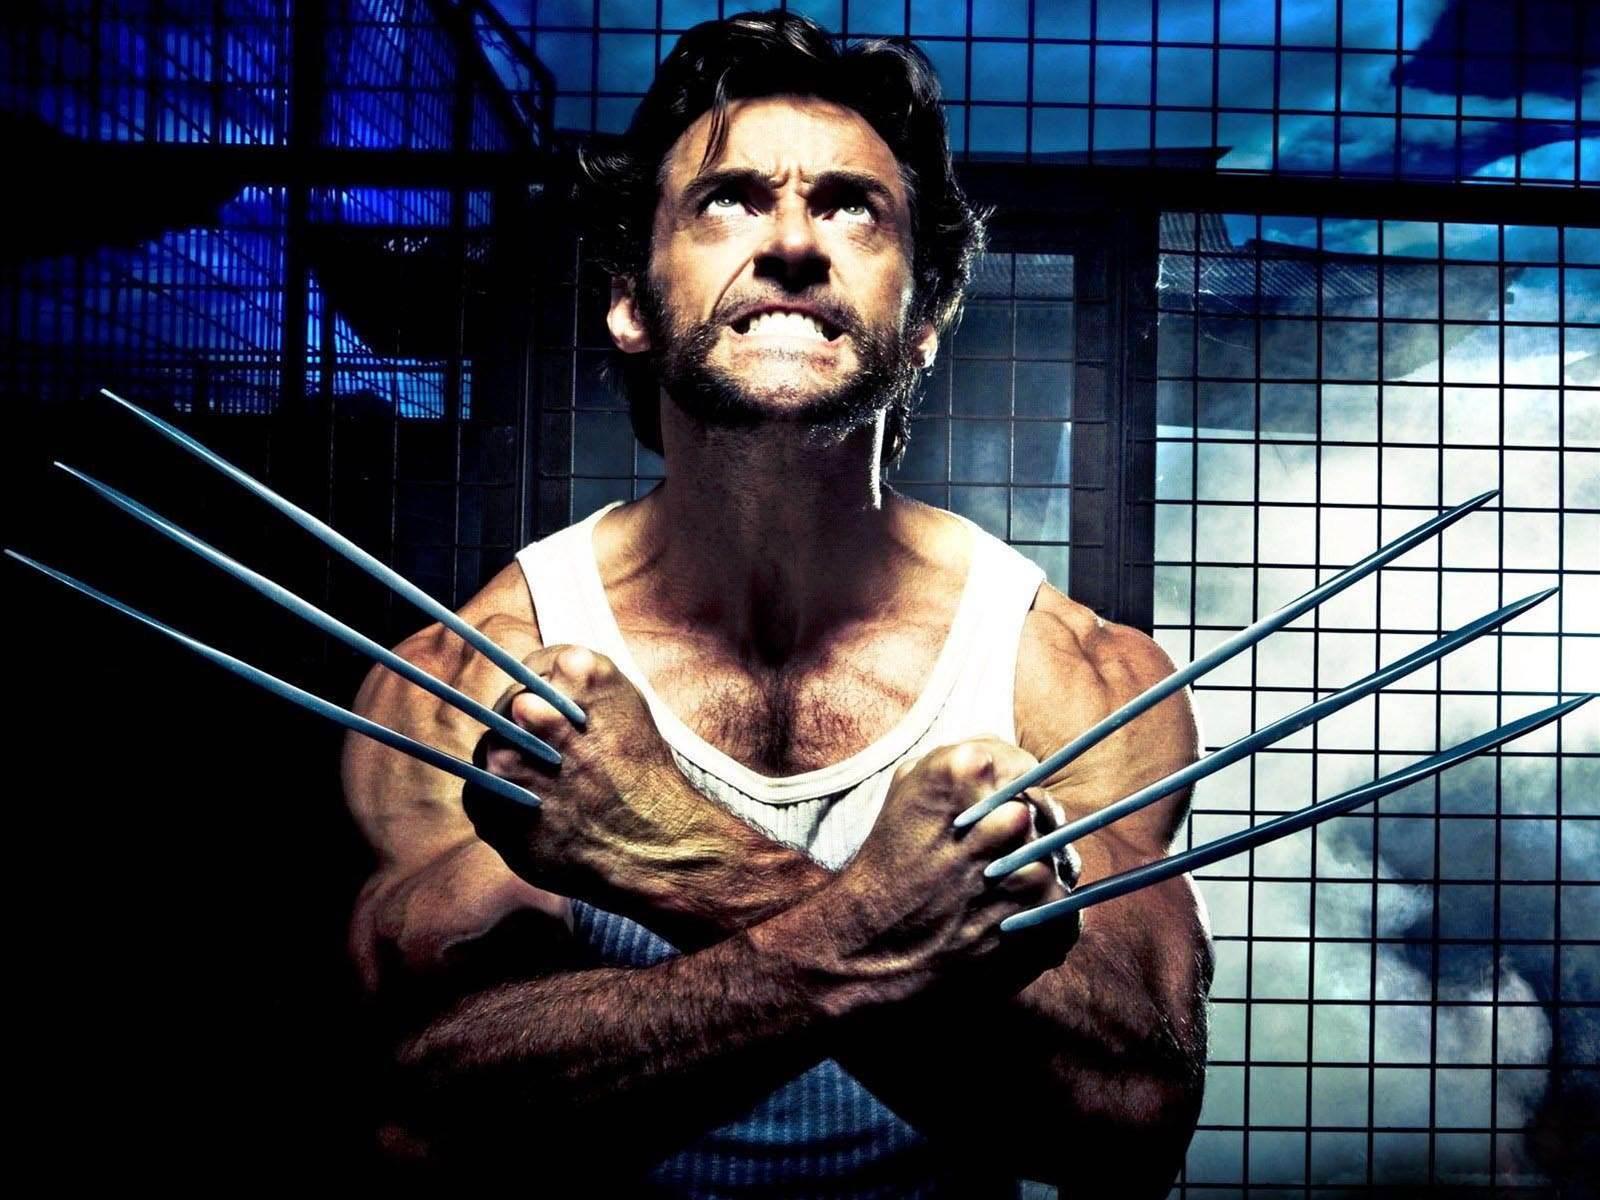 X-men Origins: Wolverine review